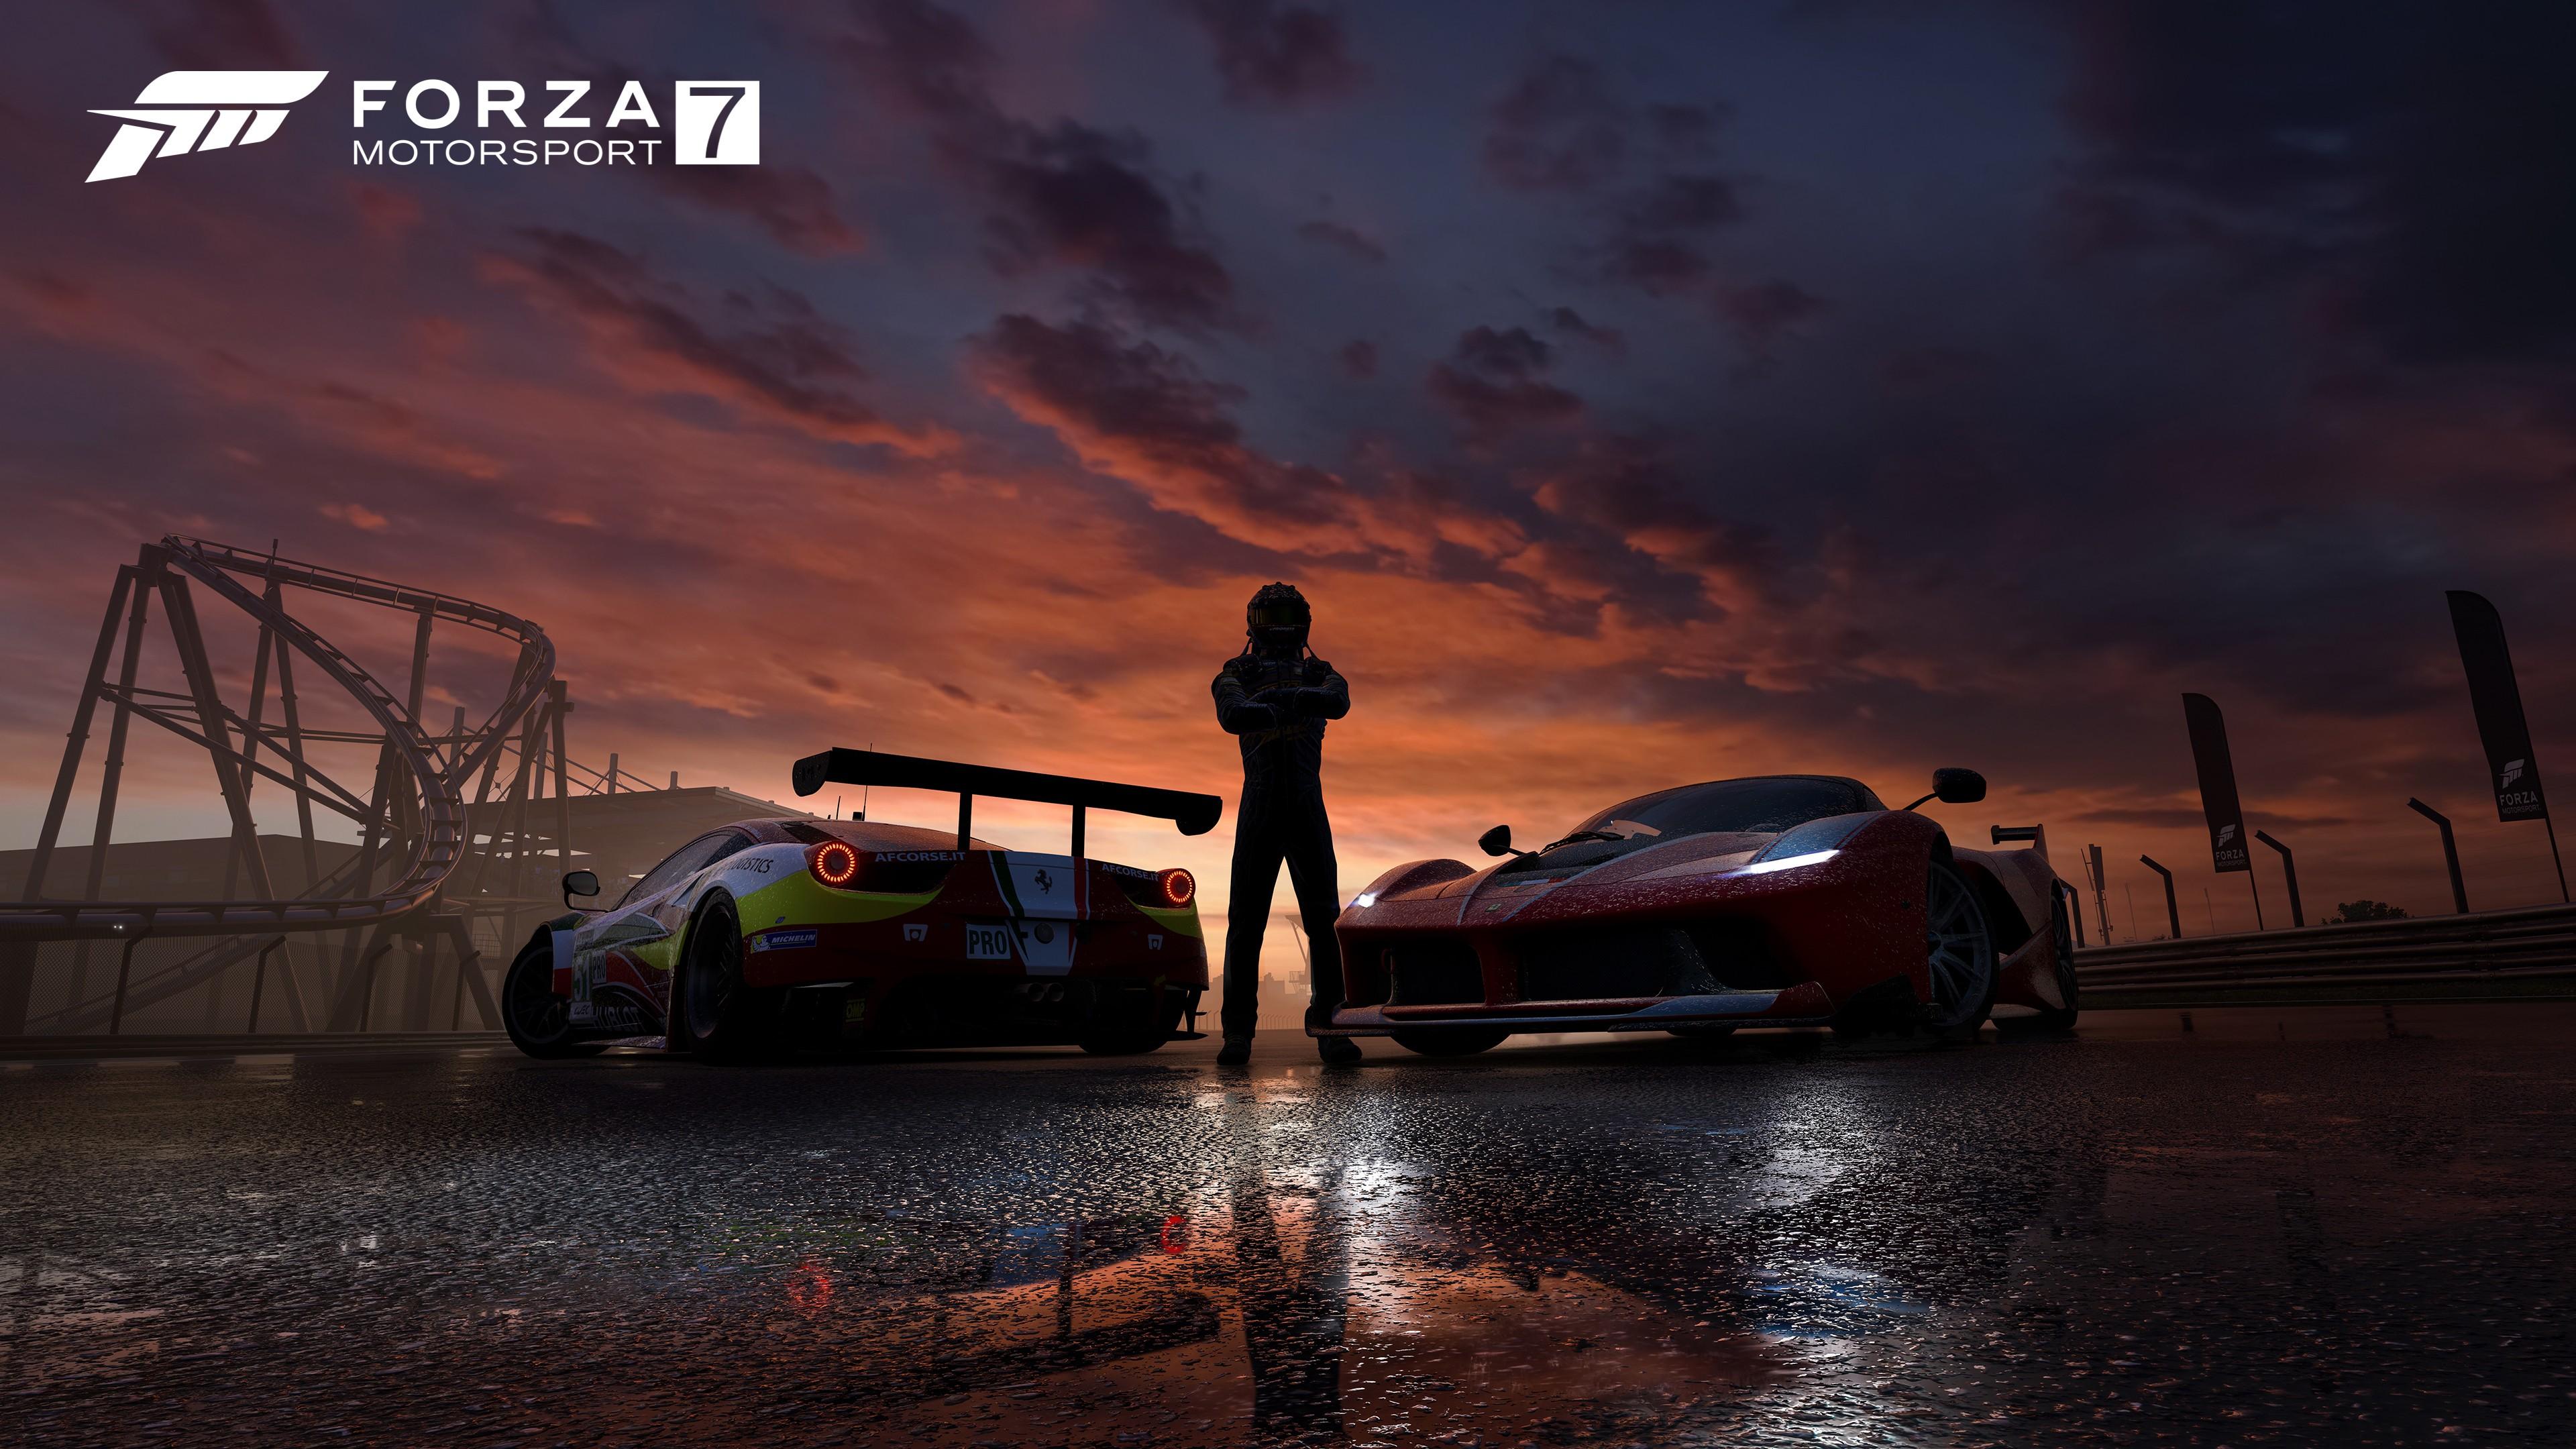 Wallpaper Full Hd 3d Games Forza Motorsport 7 4k Wallpapers Hd Wallpapers Id 20594